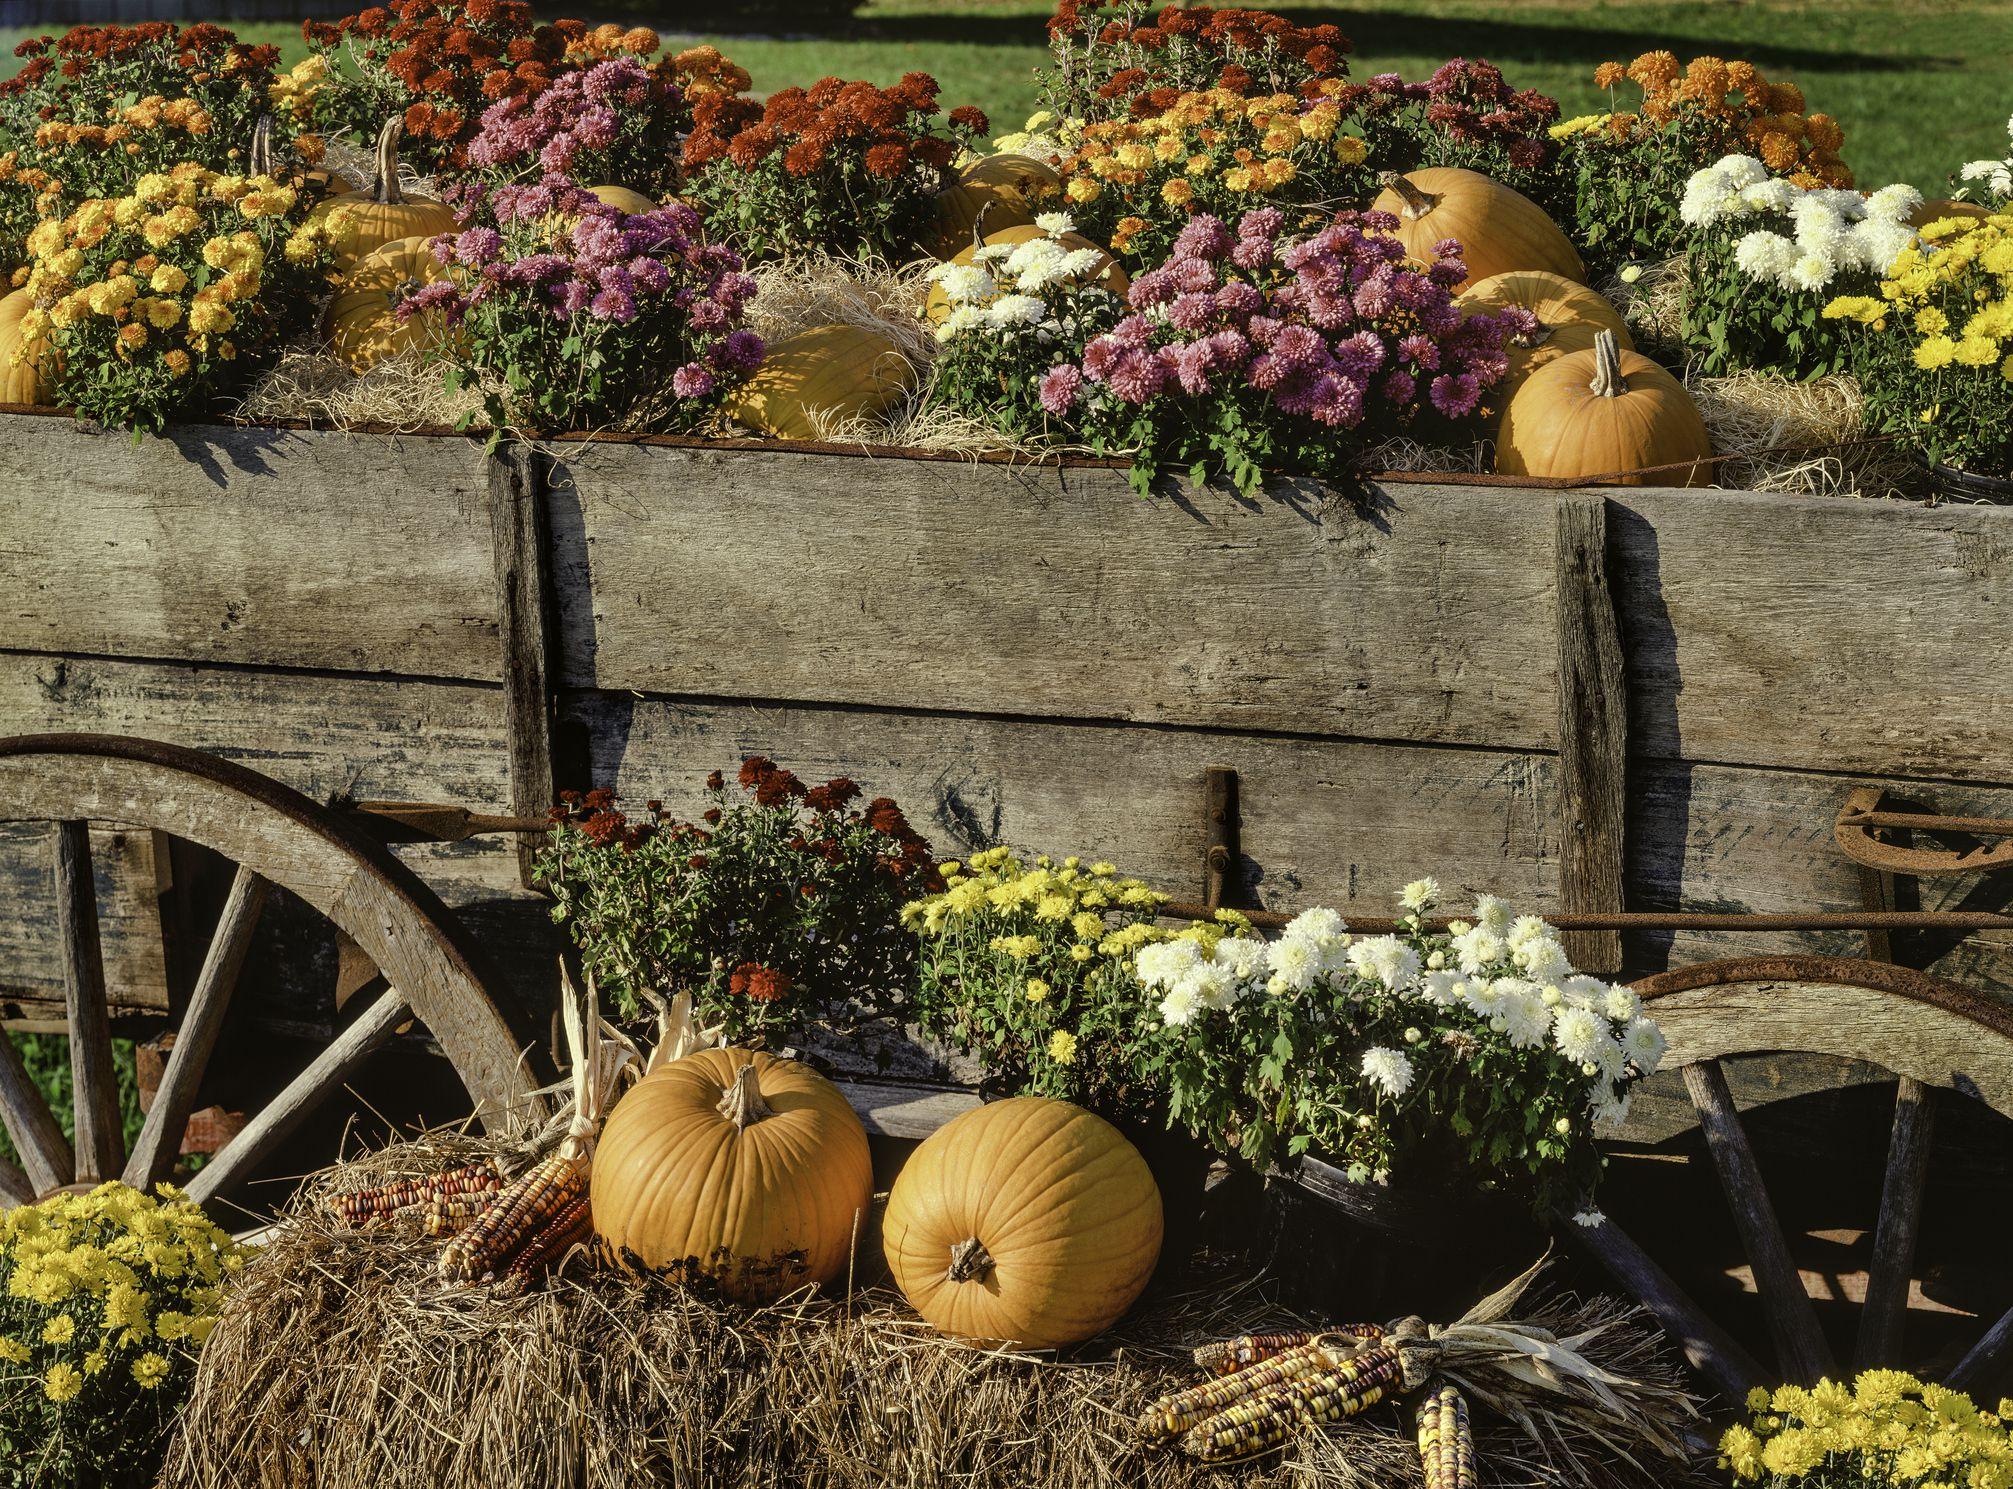 harvest pumpkins, chrysanthemums and antique farm wagon